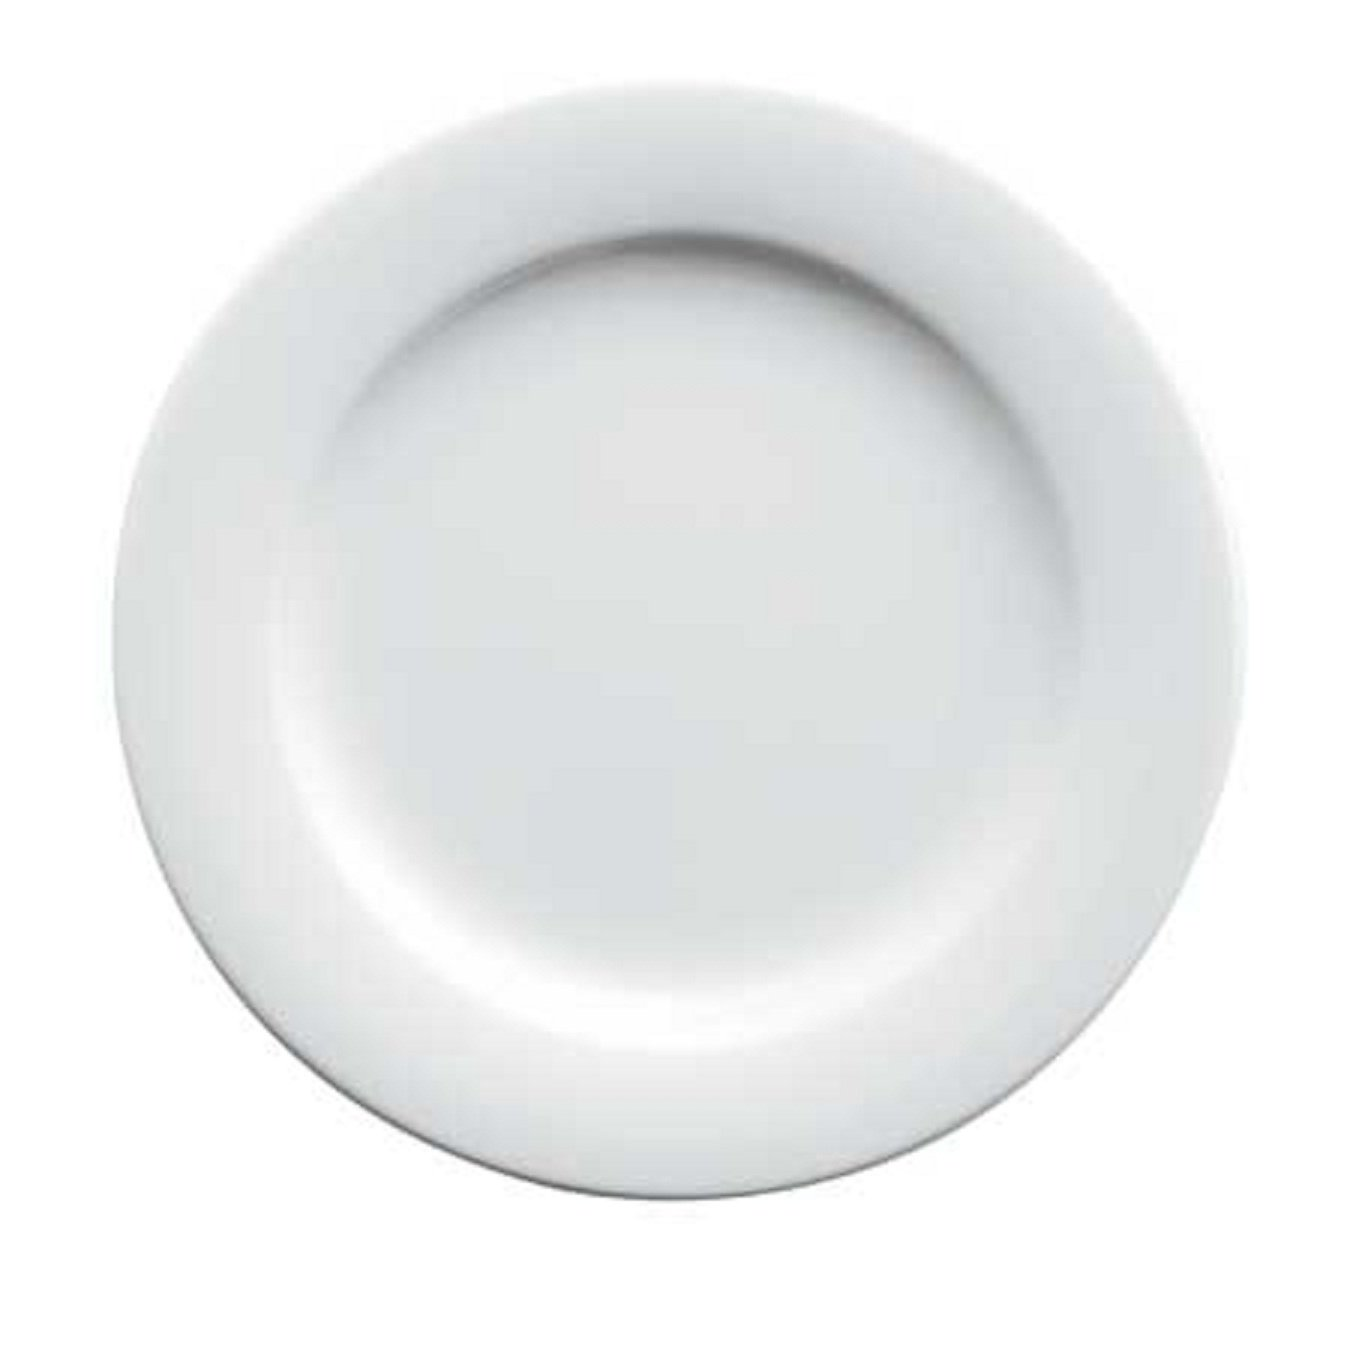 KAHLA Pronto Brunch Plate 9 Inches, White Color, 1 Piece